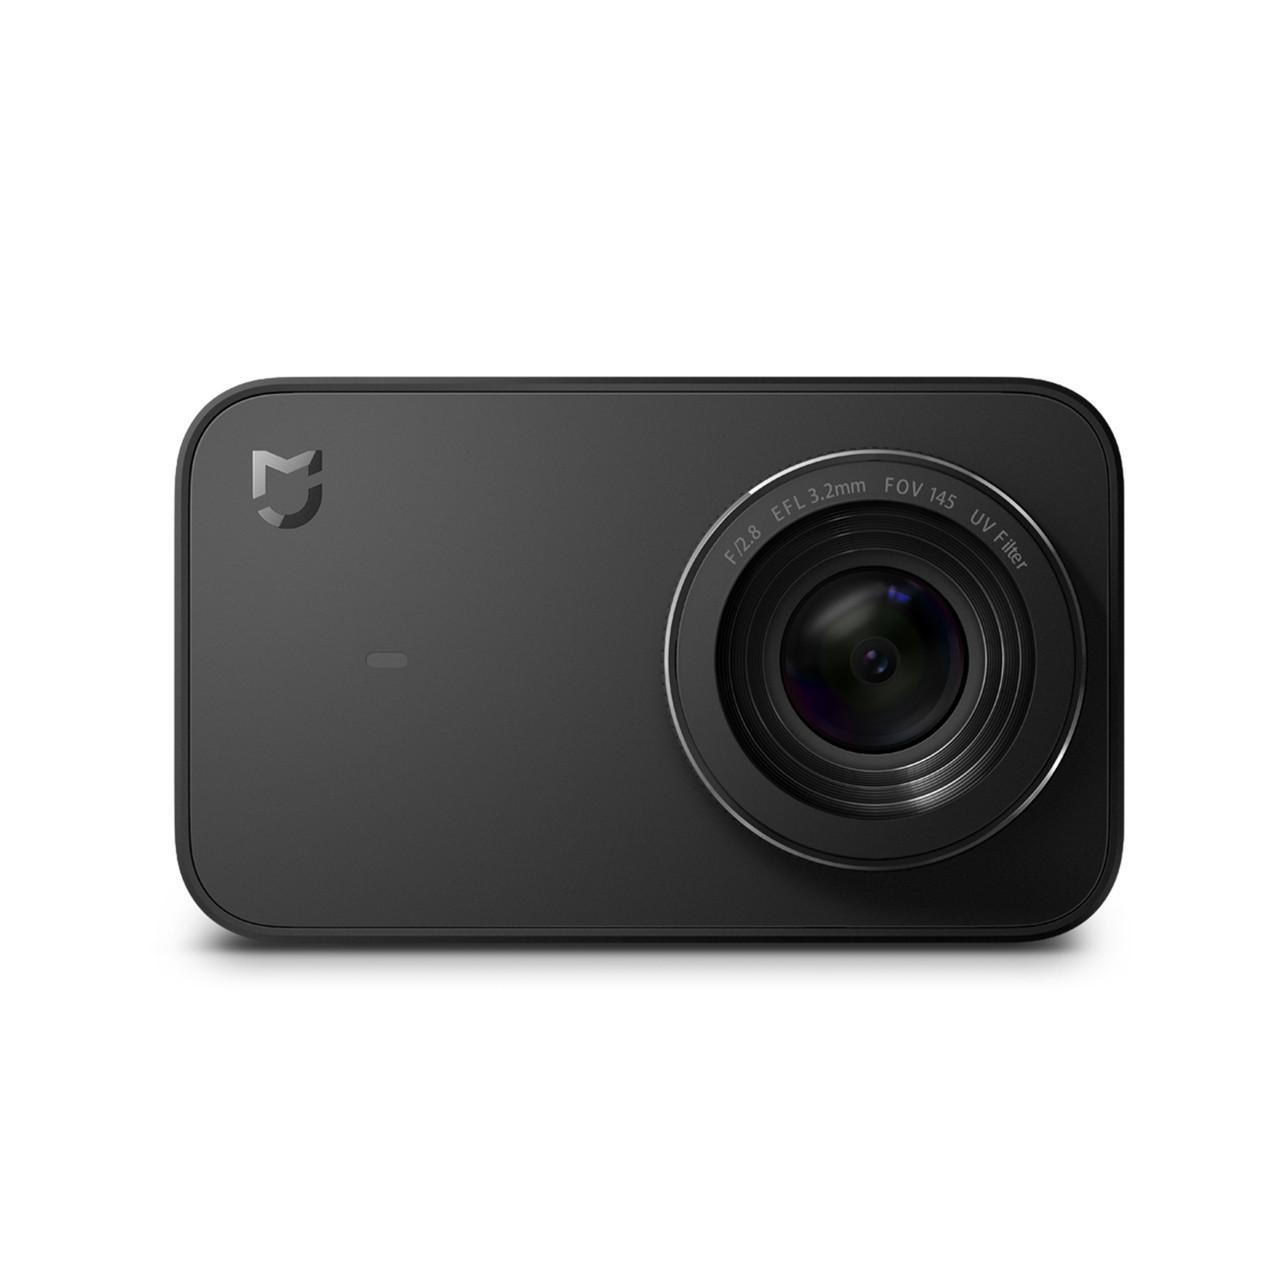 Экшн-камера Xiaomi MiJia Compact 4k, Black